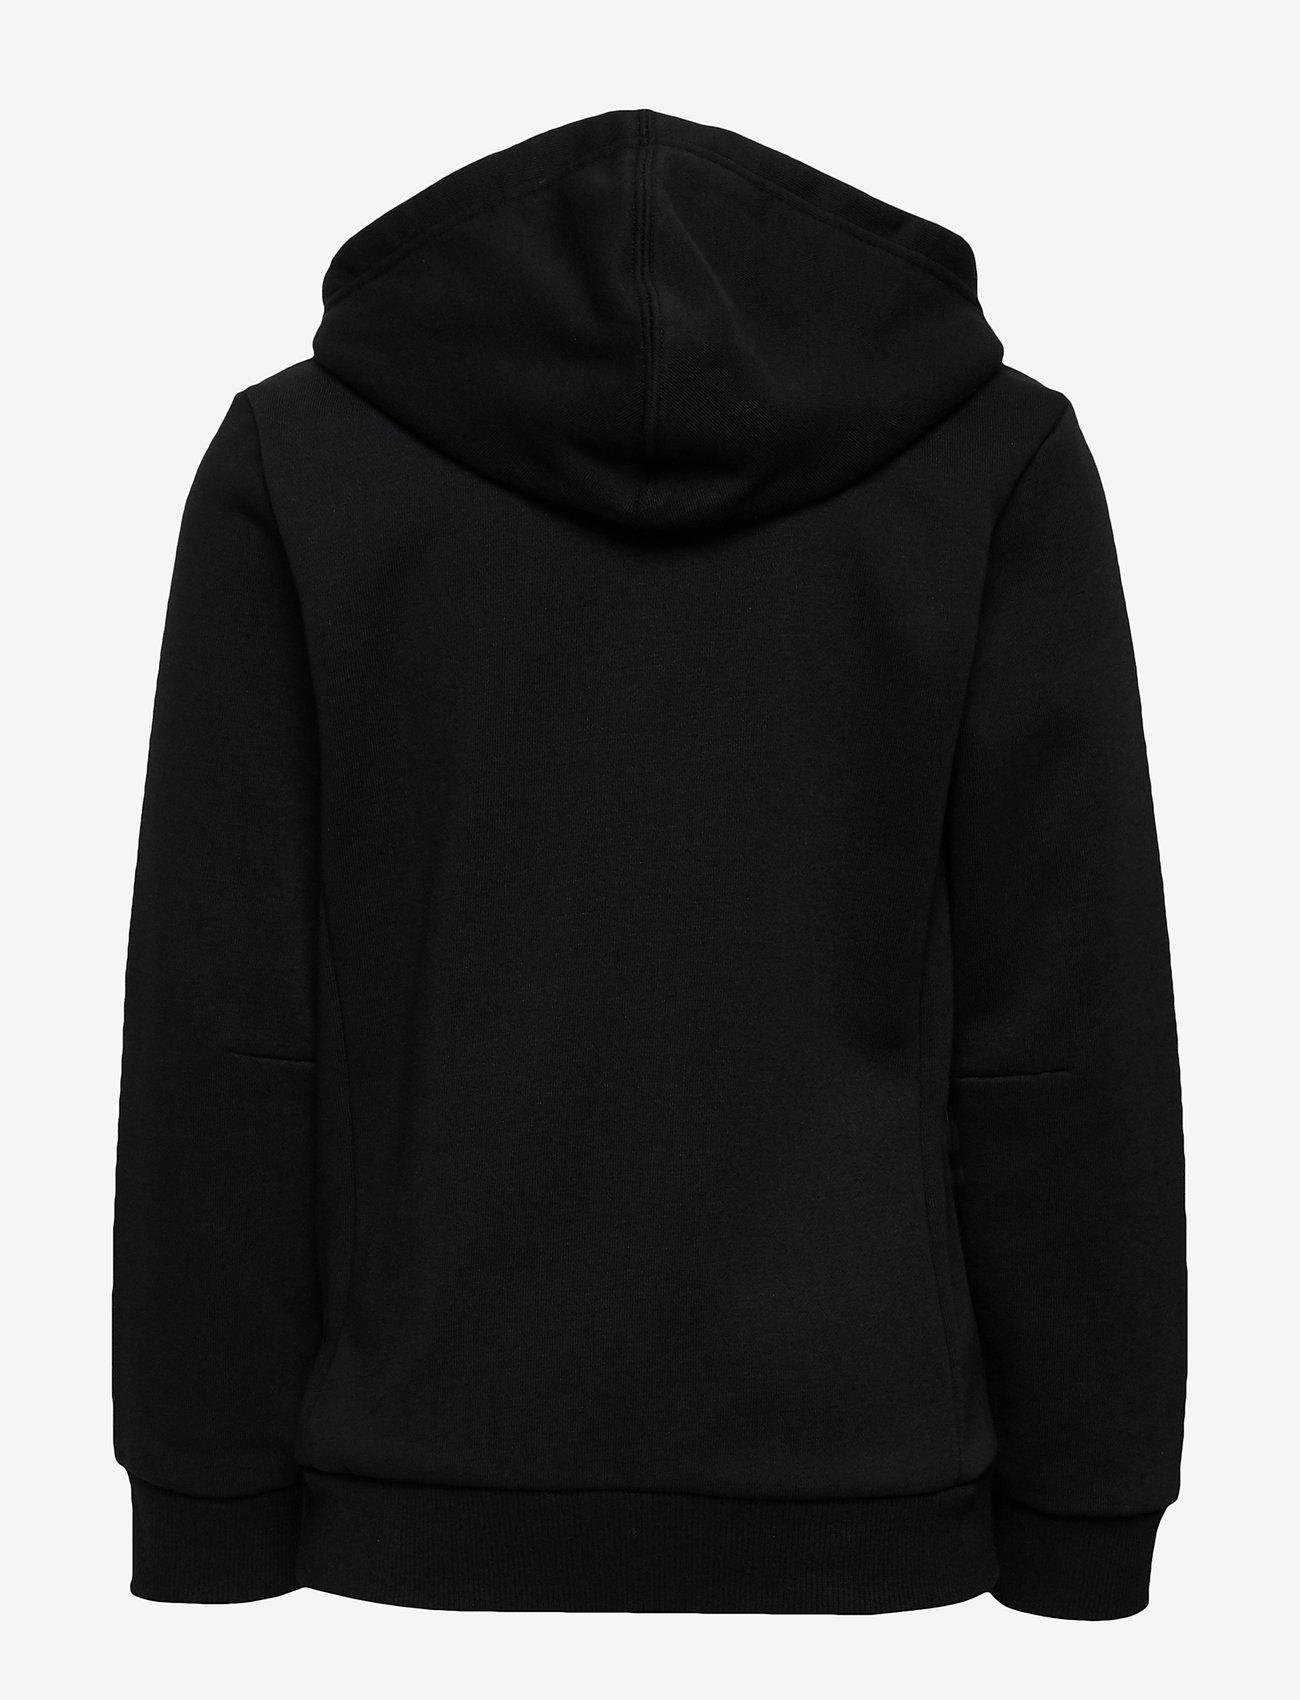 adidas Performance - YB MH BOS PO - kapuzenpullover - black/white - 1